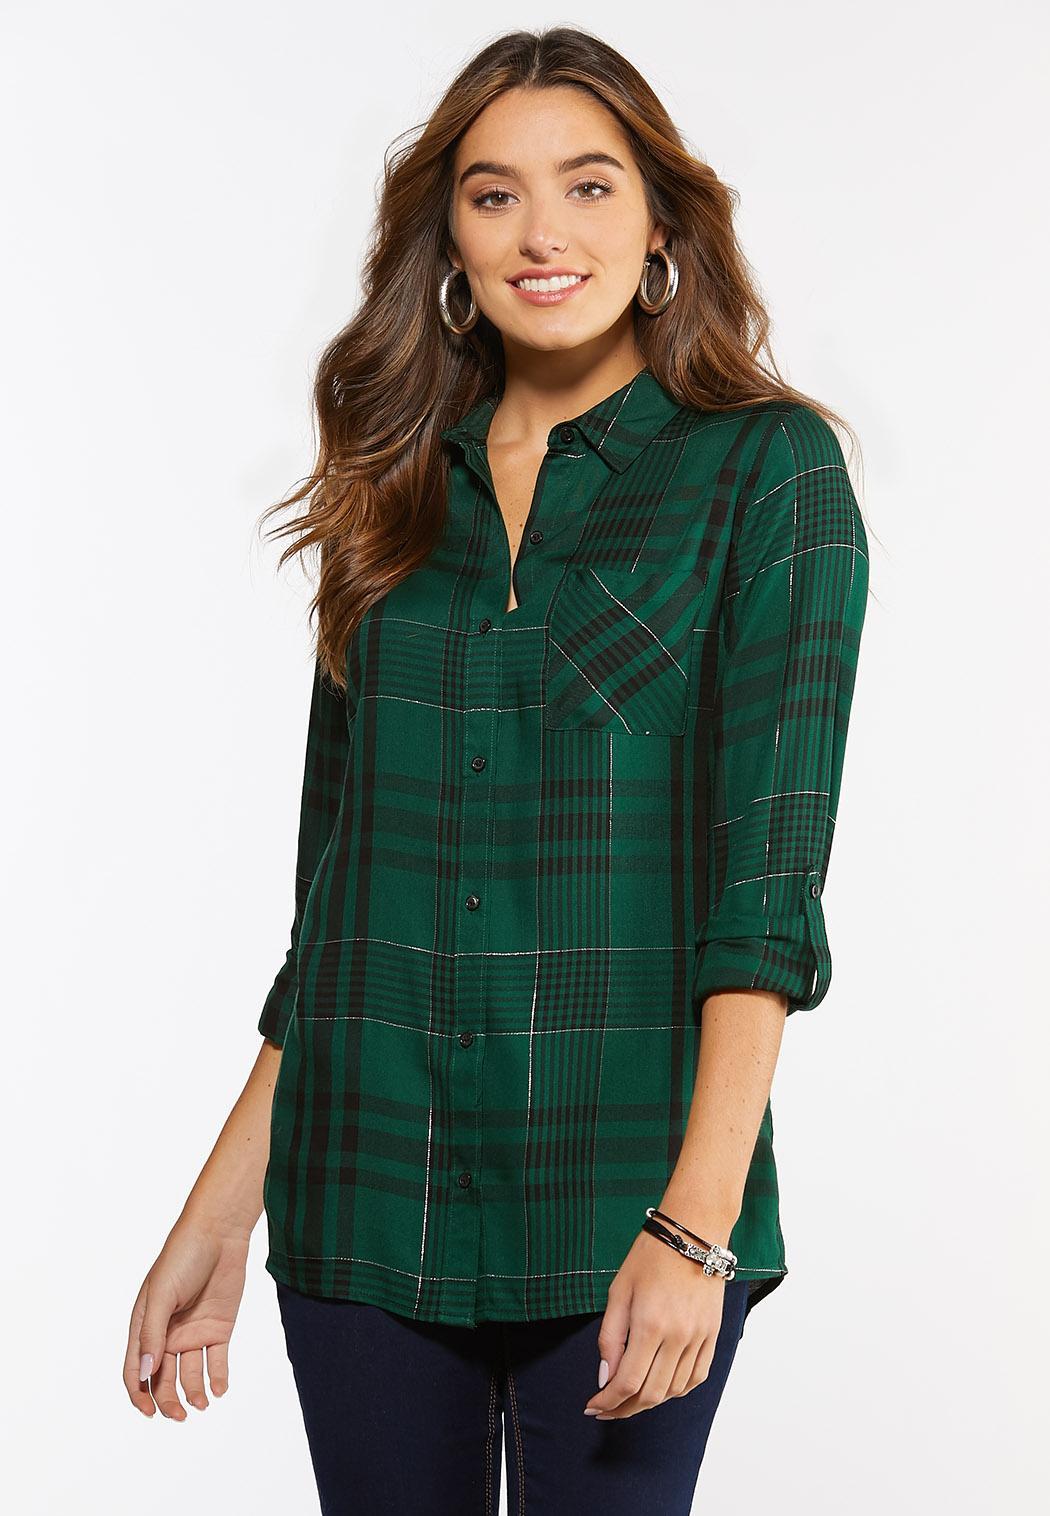 Green Plaid Tunic